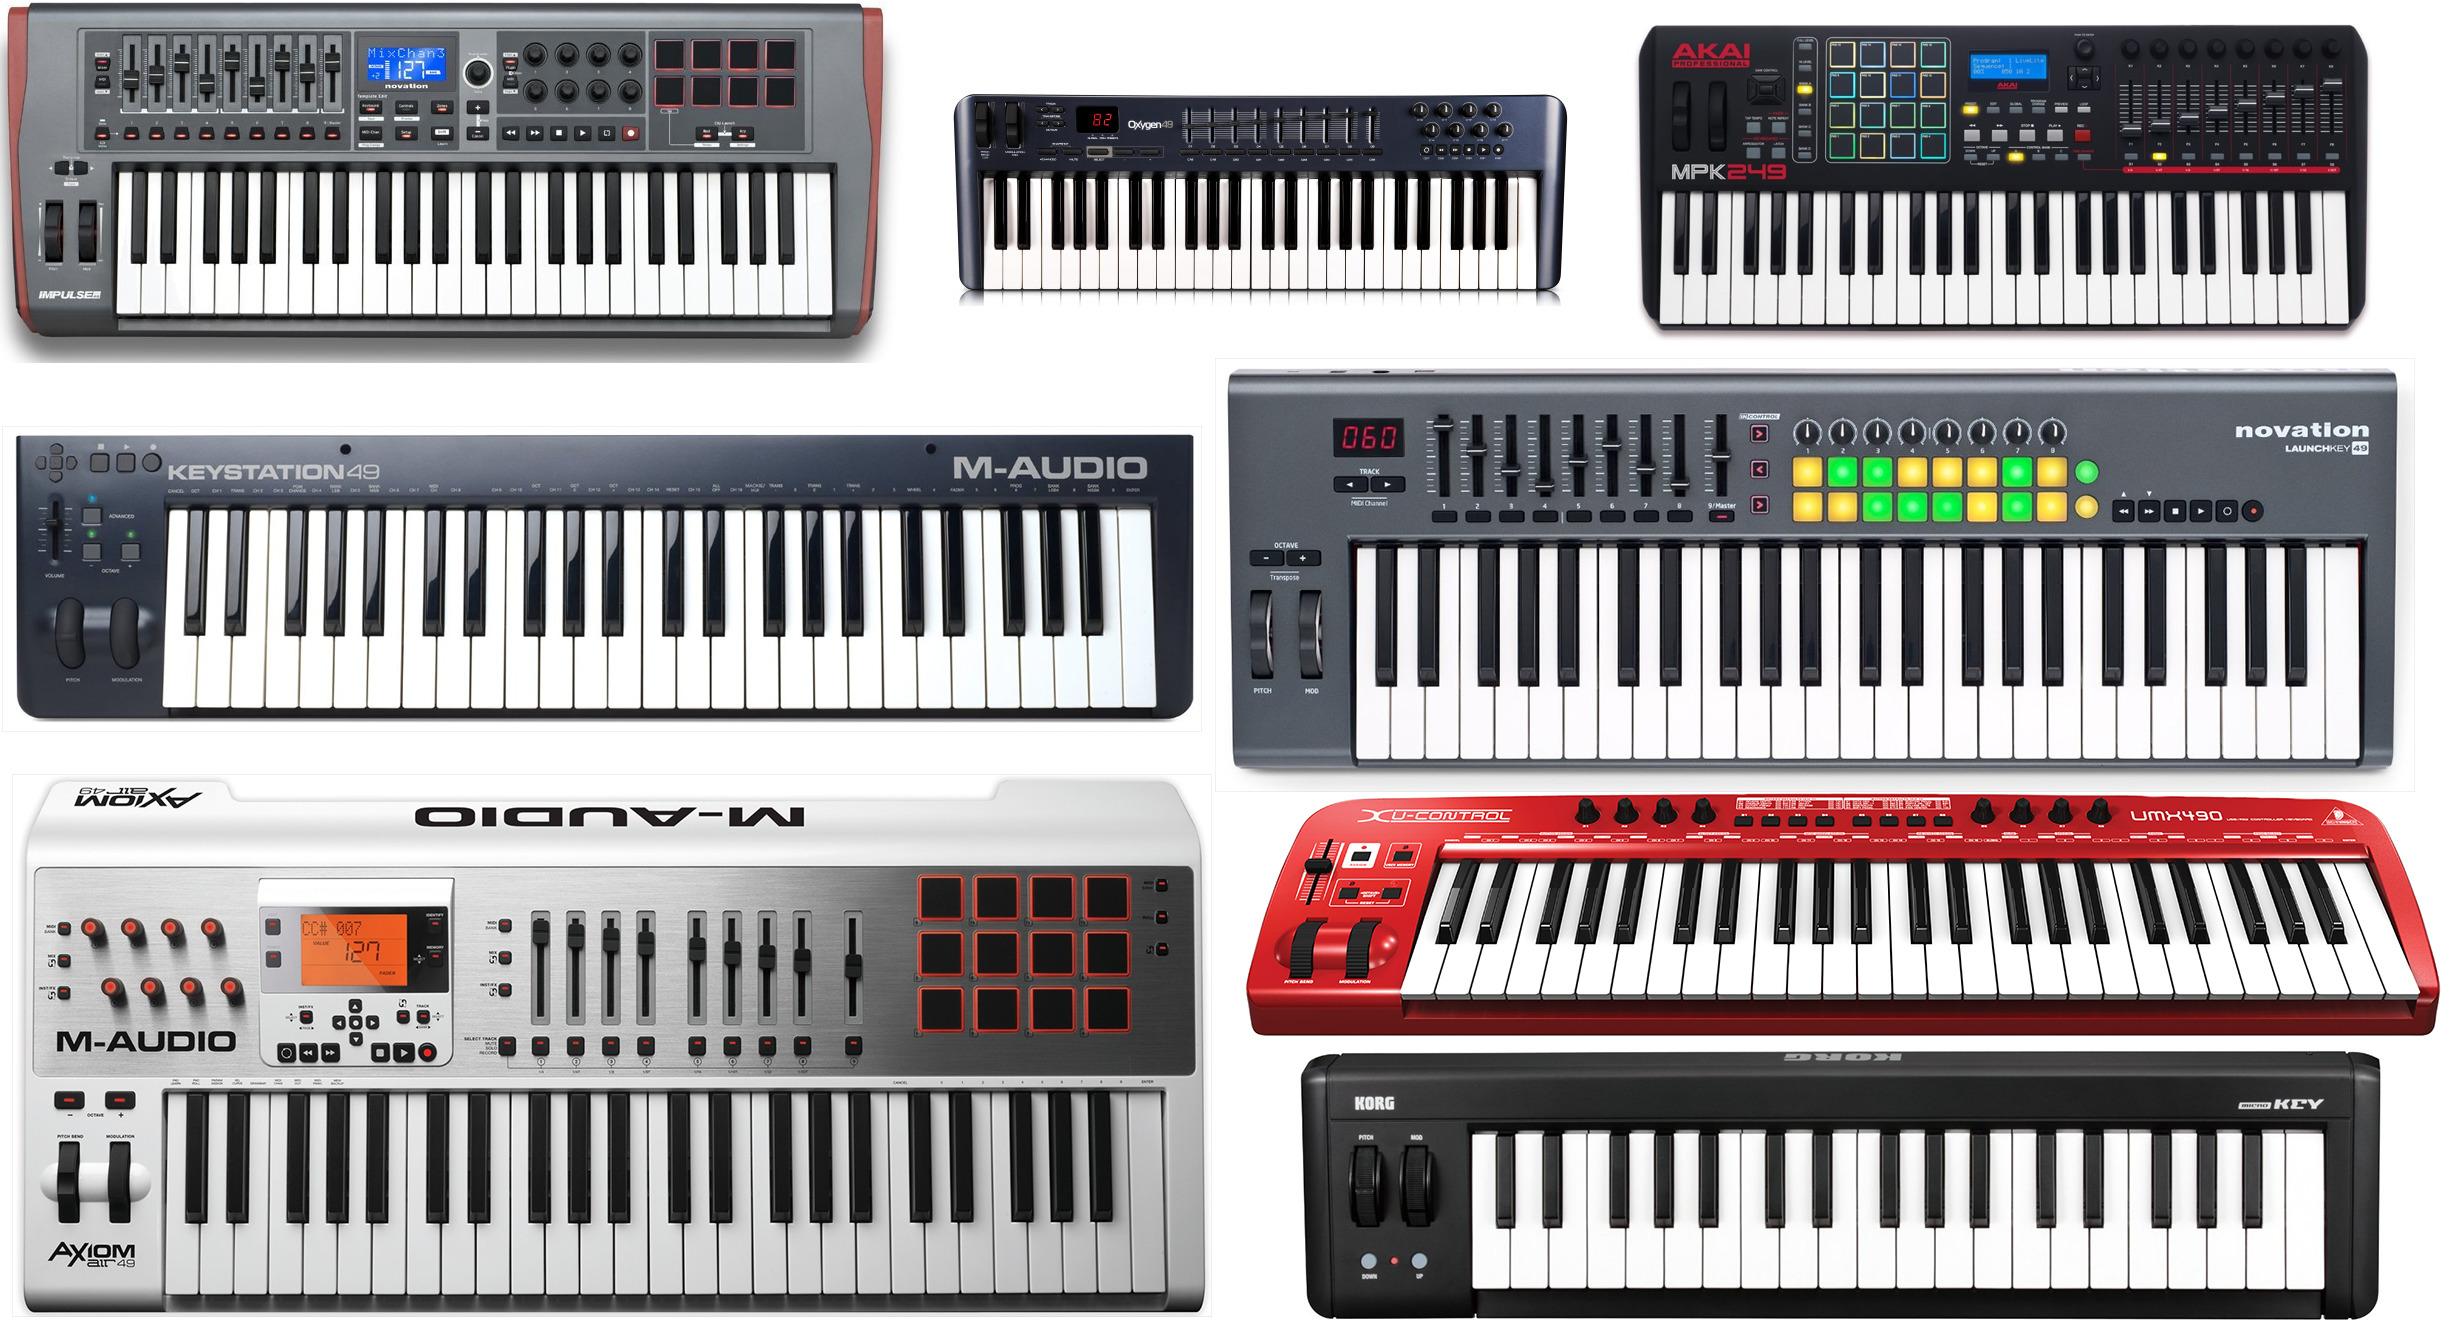 köpguide digitalpiano köpa piano